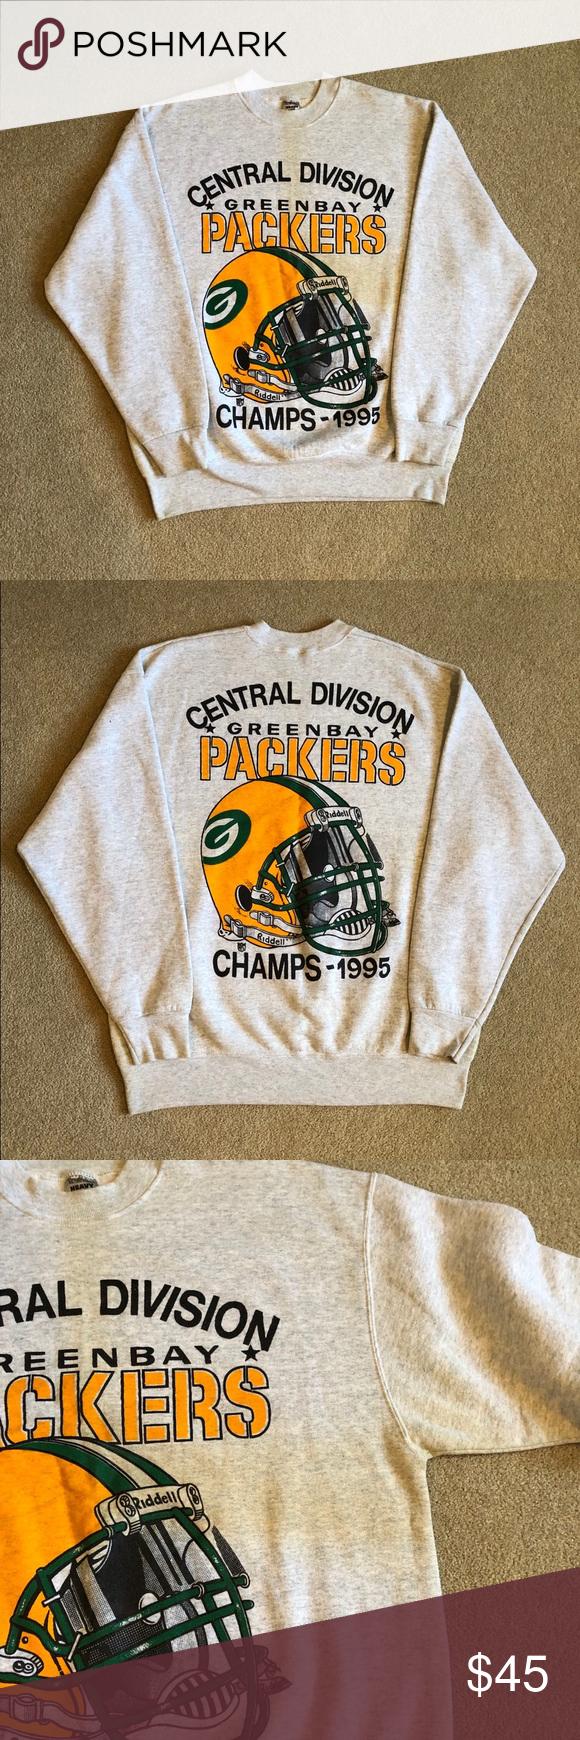 Vintage 1995 Green Bay Packers Sweatshirt Men S L In 2020 Sweatshirts Green Bay Packers Sweatshirt Packers Sweatshirt